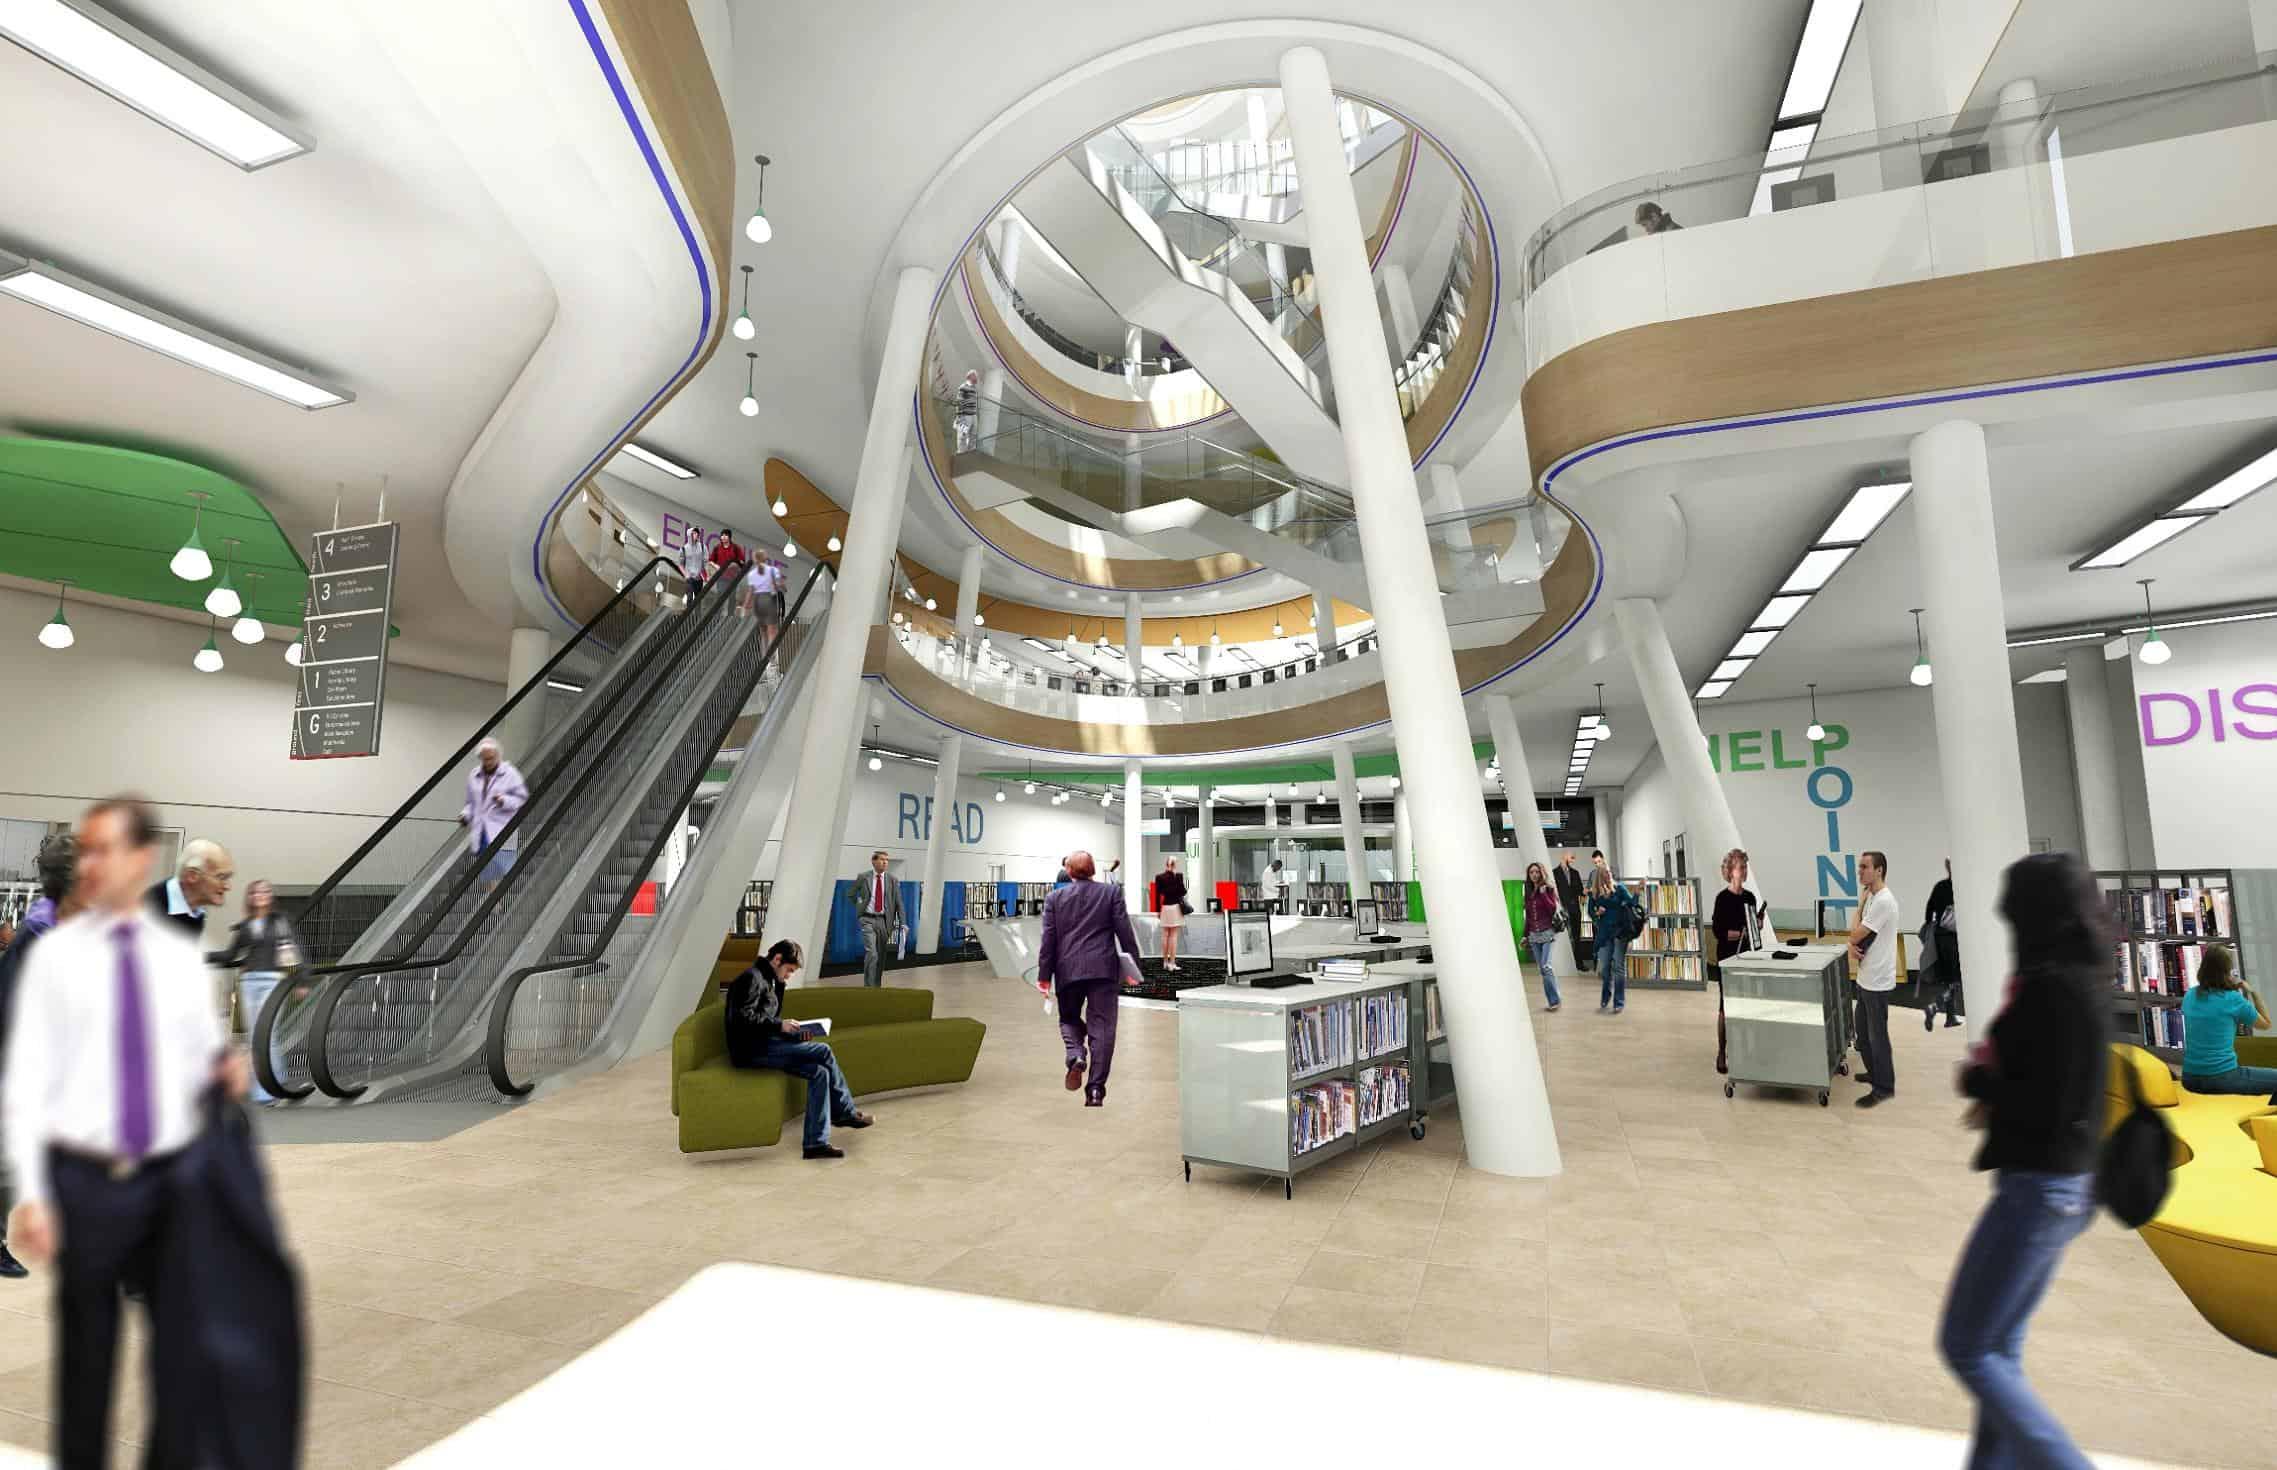 central-library-entrance-atrium-resized